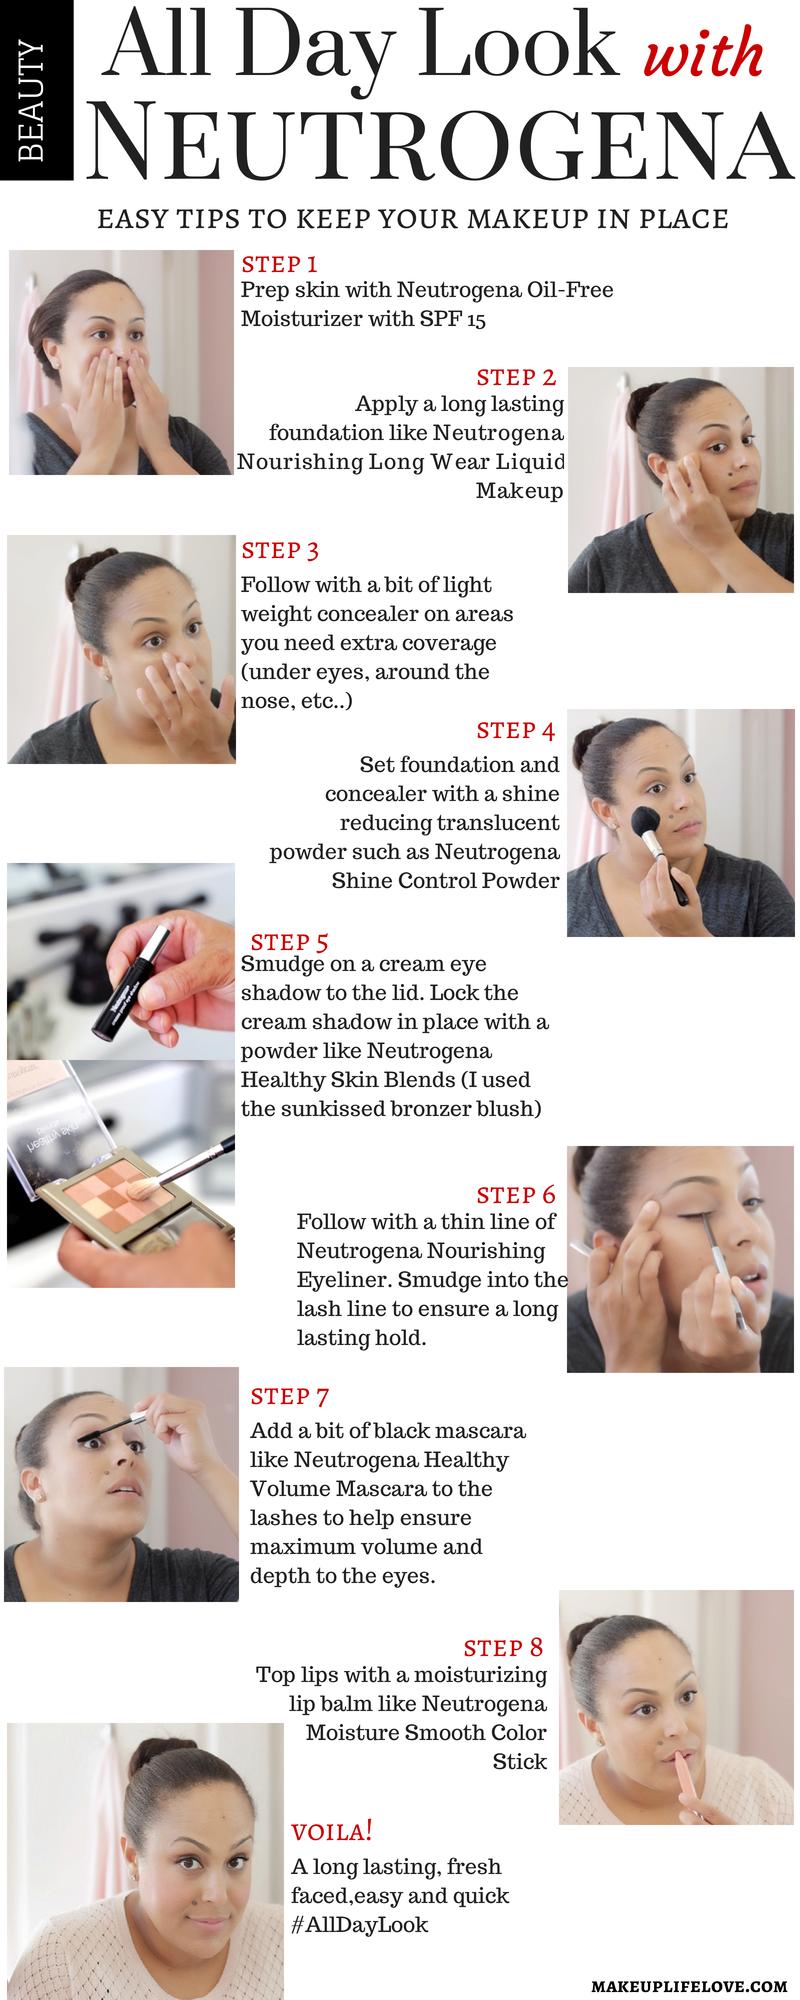 #AllDayLook- Neutrogena-#shop-#ad-#CollectiveBias-beauty-beauty tutorials- makeup tips-makeup-Neutrogena-Tutorial